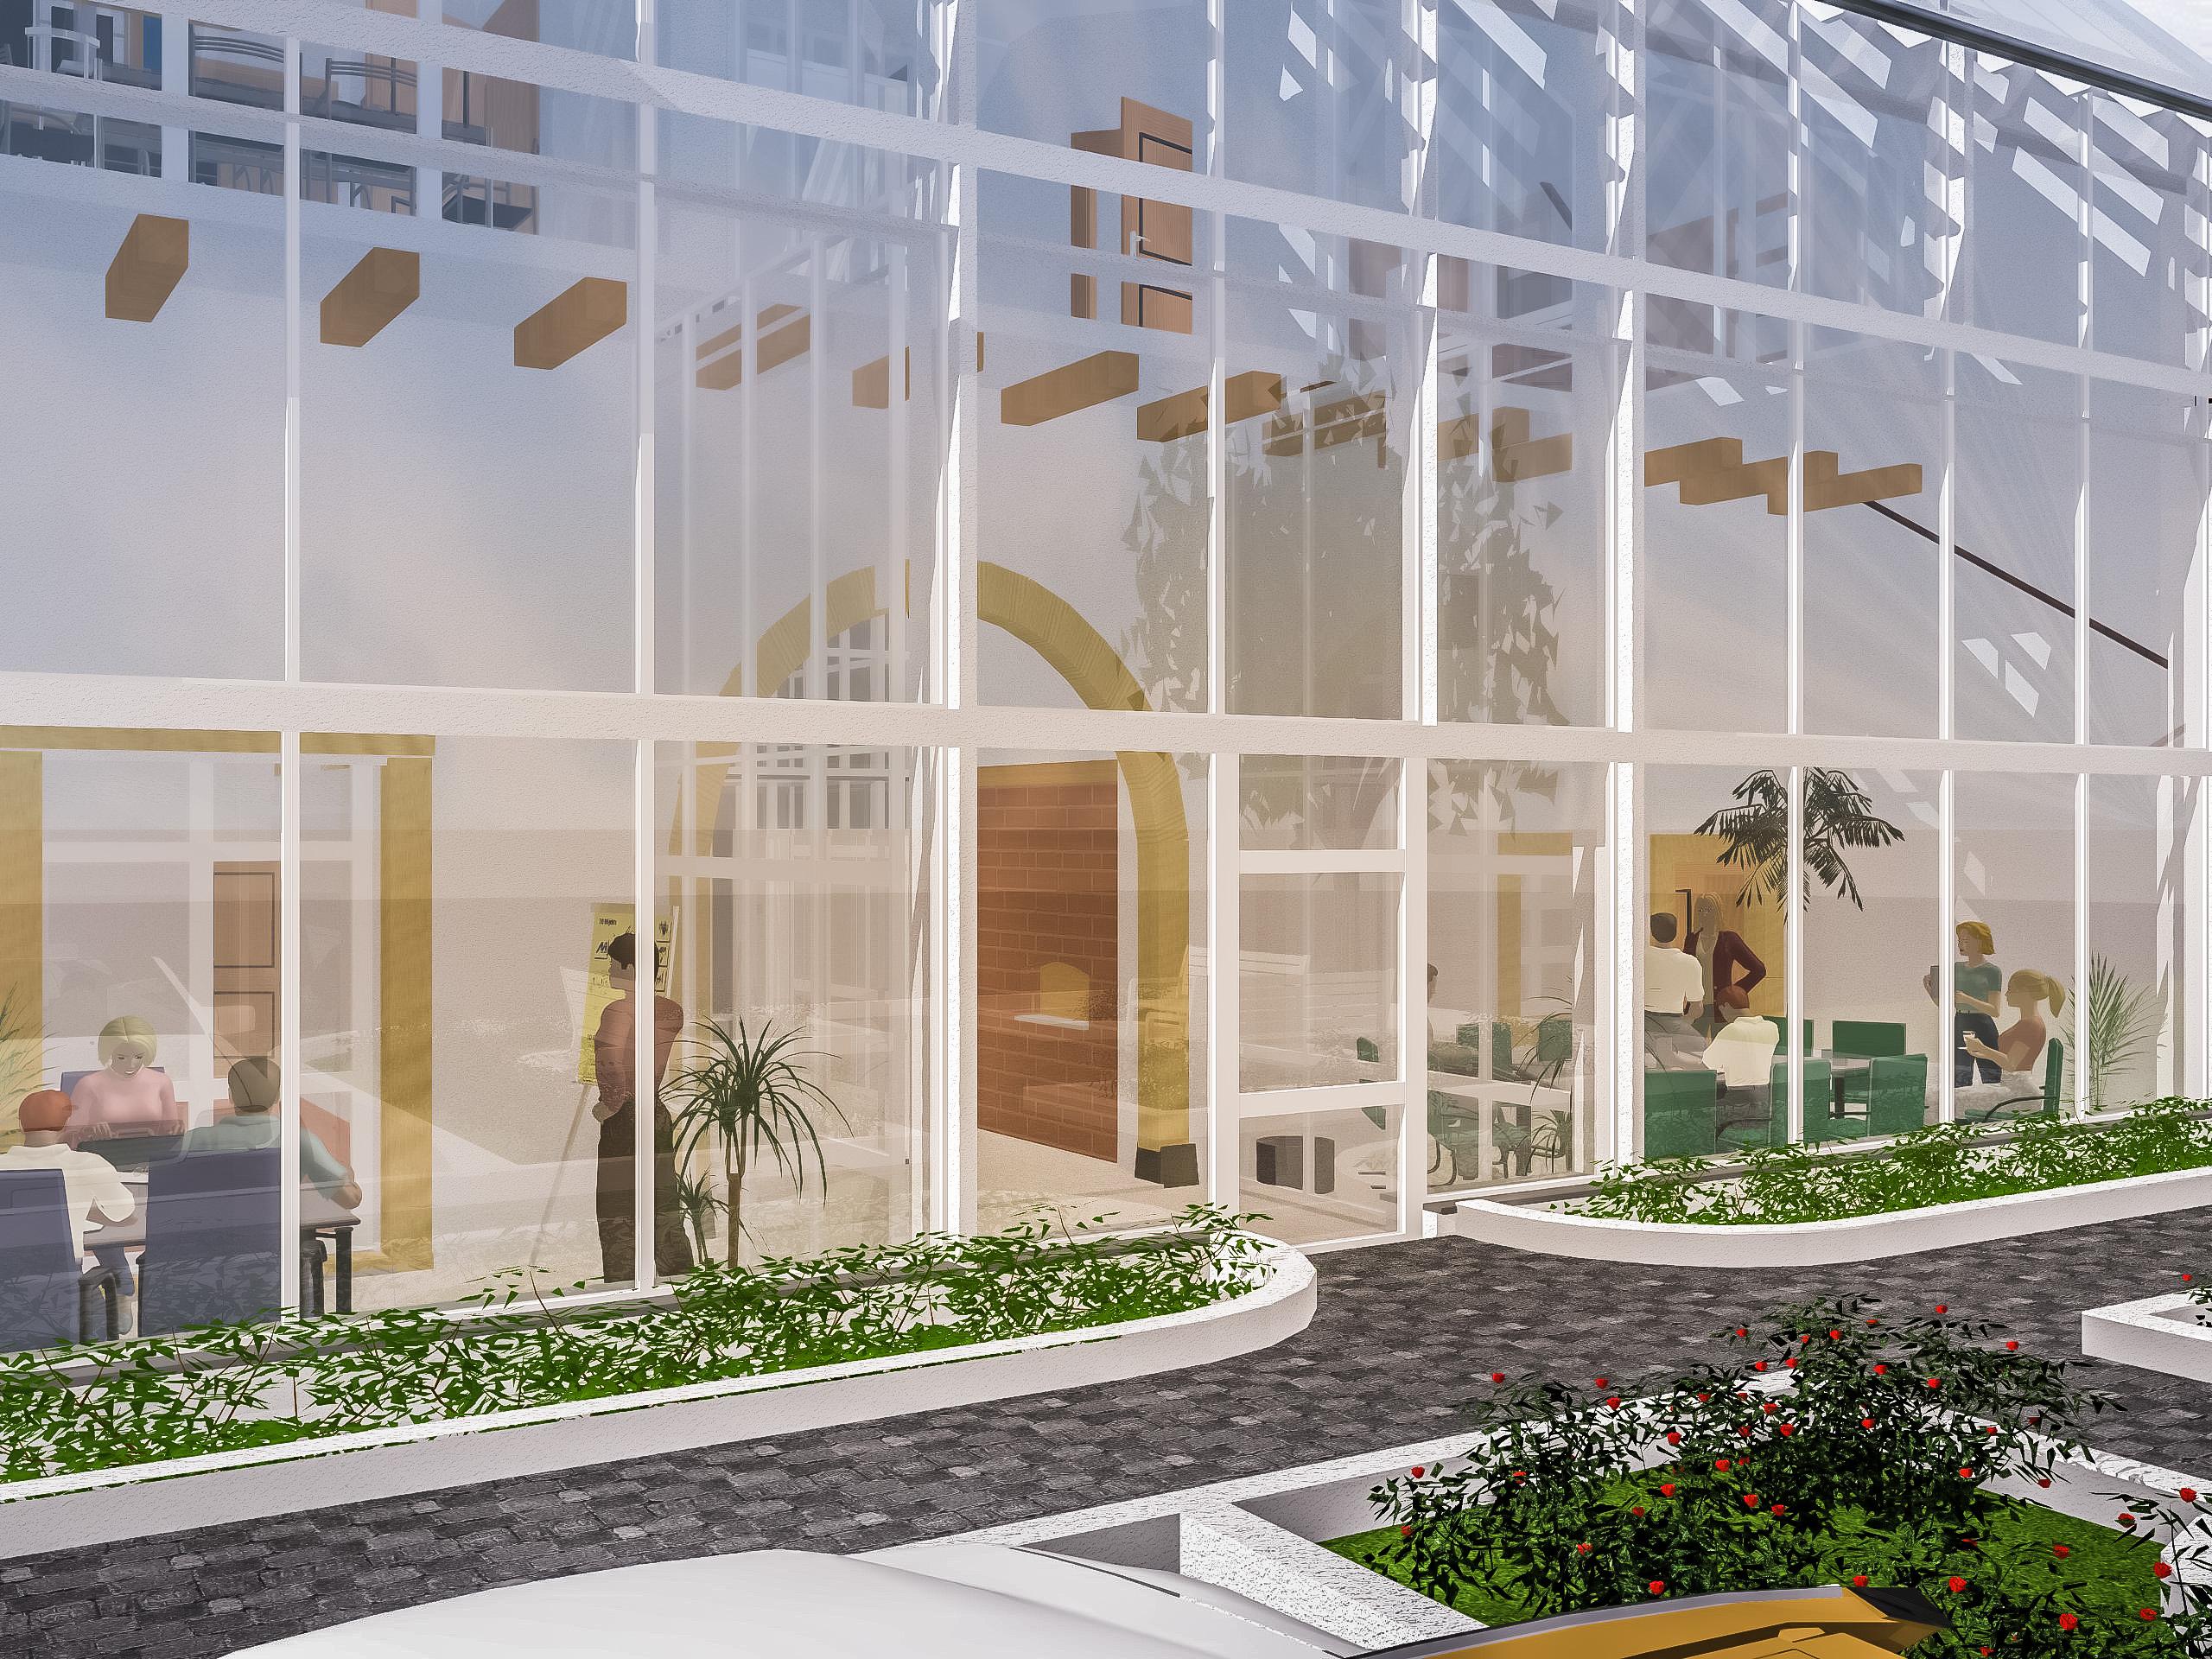 Gasthaus Visualisierung 3D